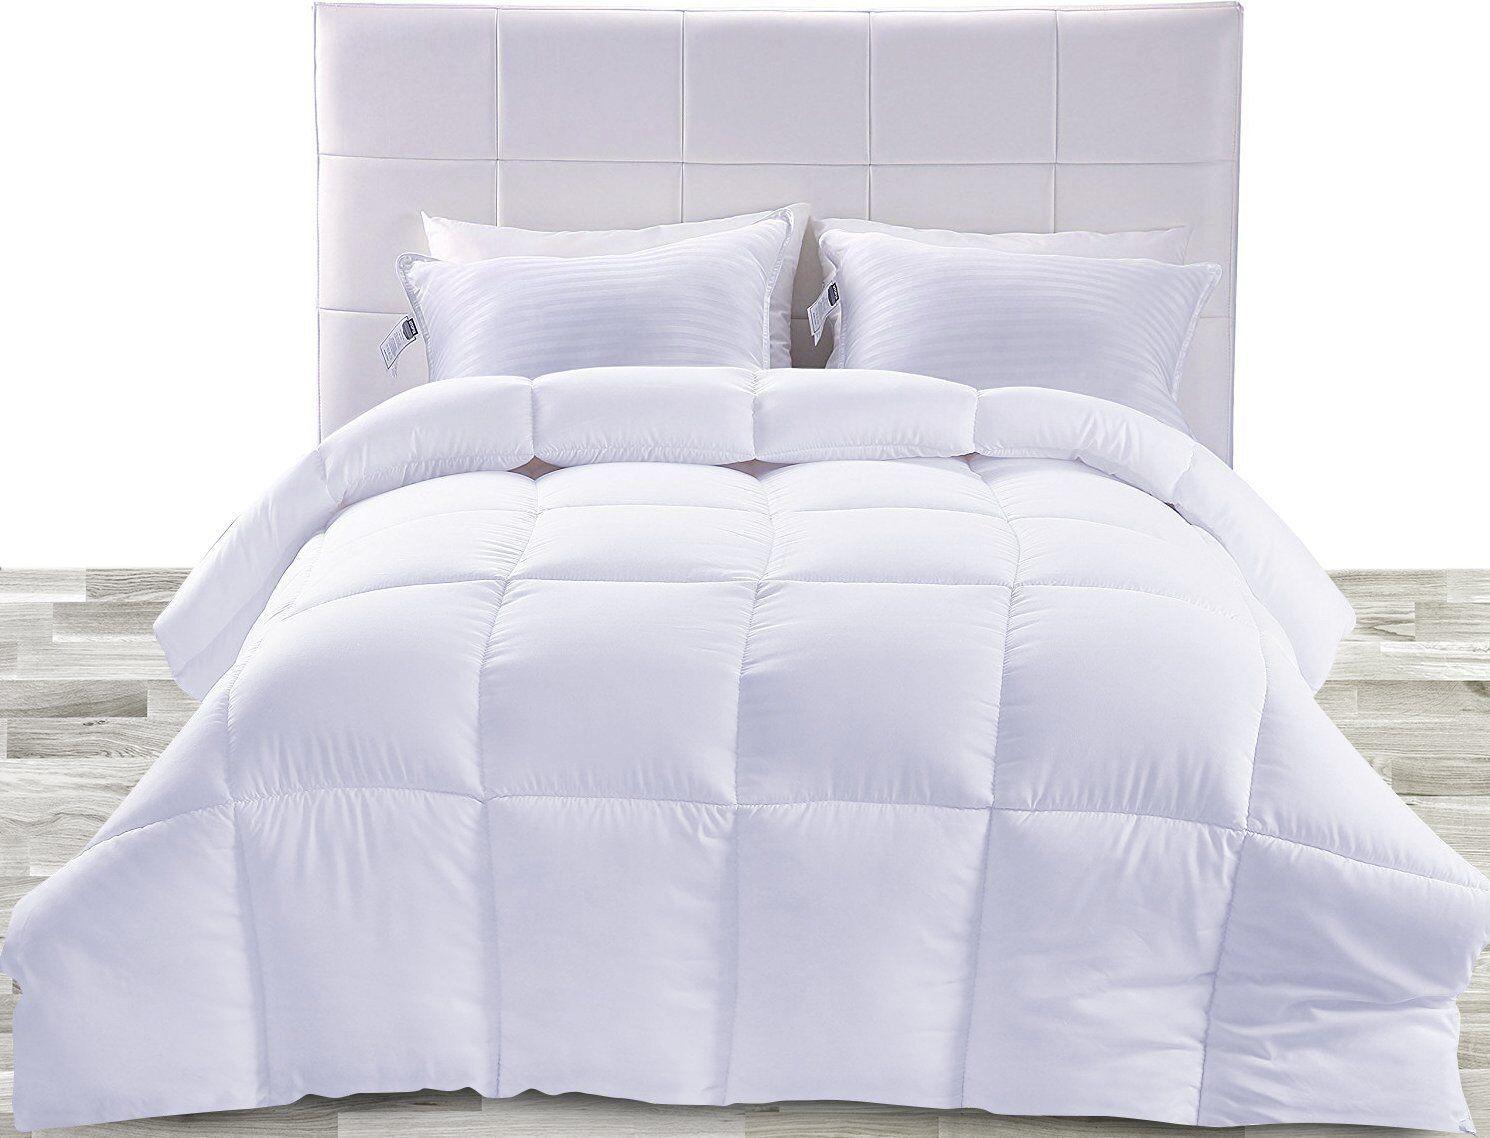 Utopia Bedding Down Alternative Comforter (White, Queen) - All Season Comforter